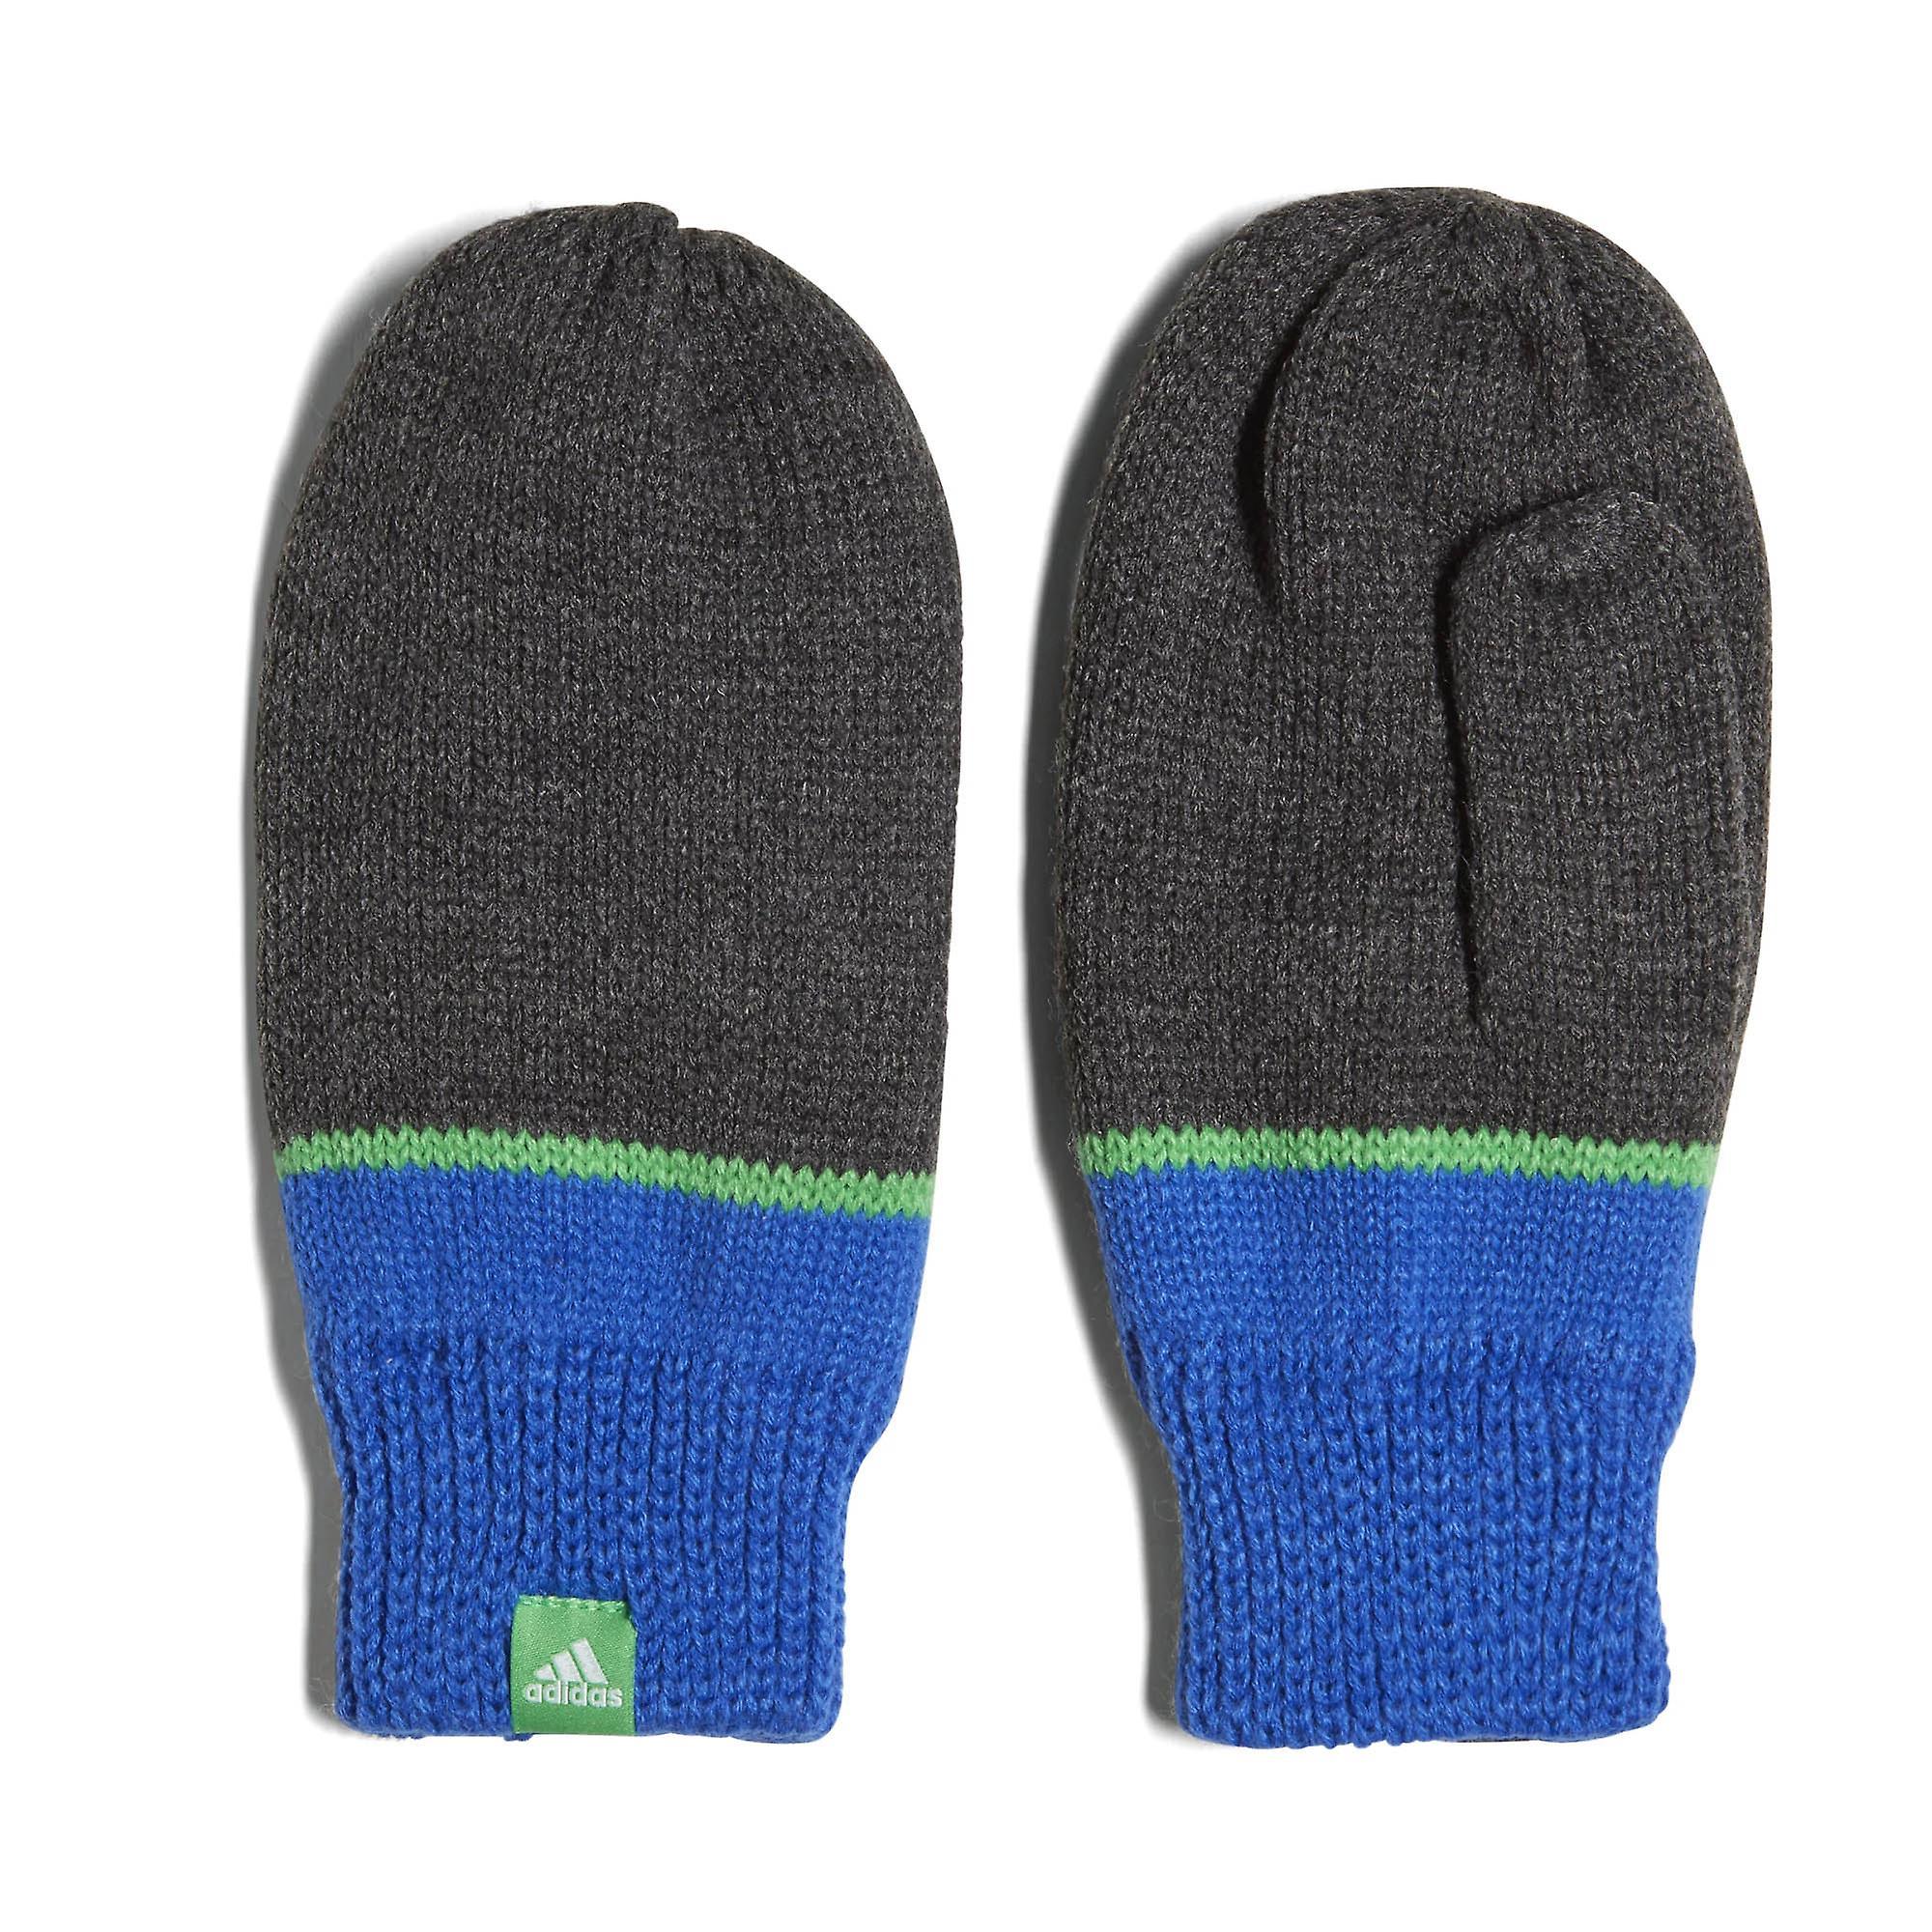 adidas Stripy Little Kids Knitted Winter Mittens Gloves Grey/Blue